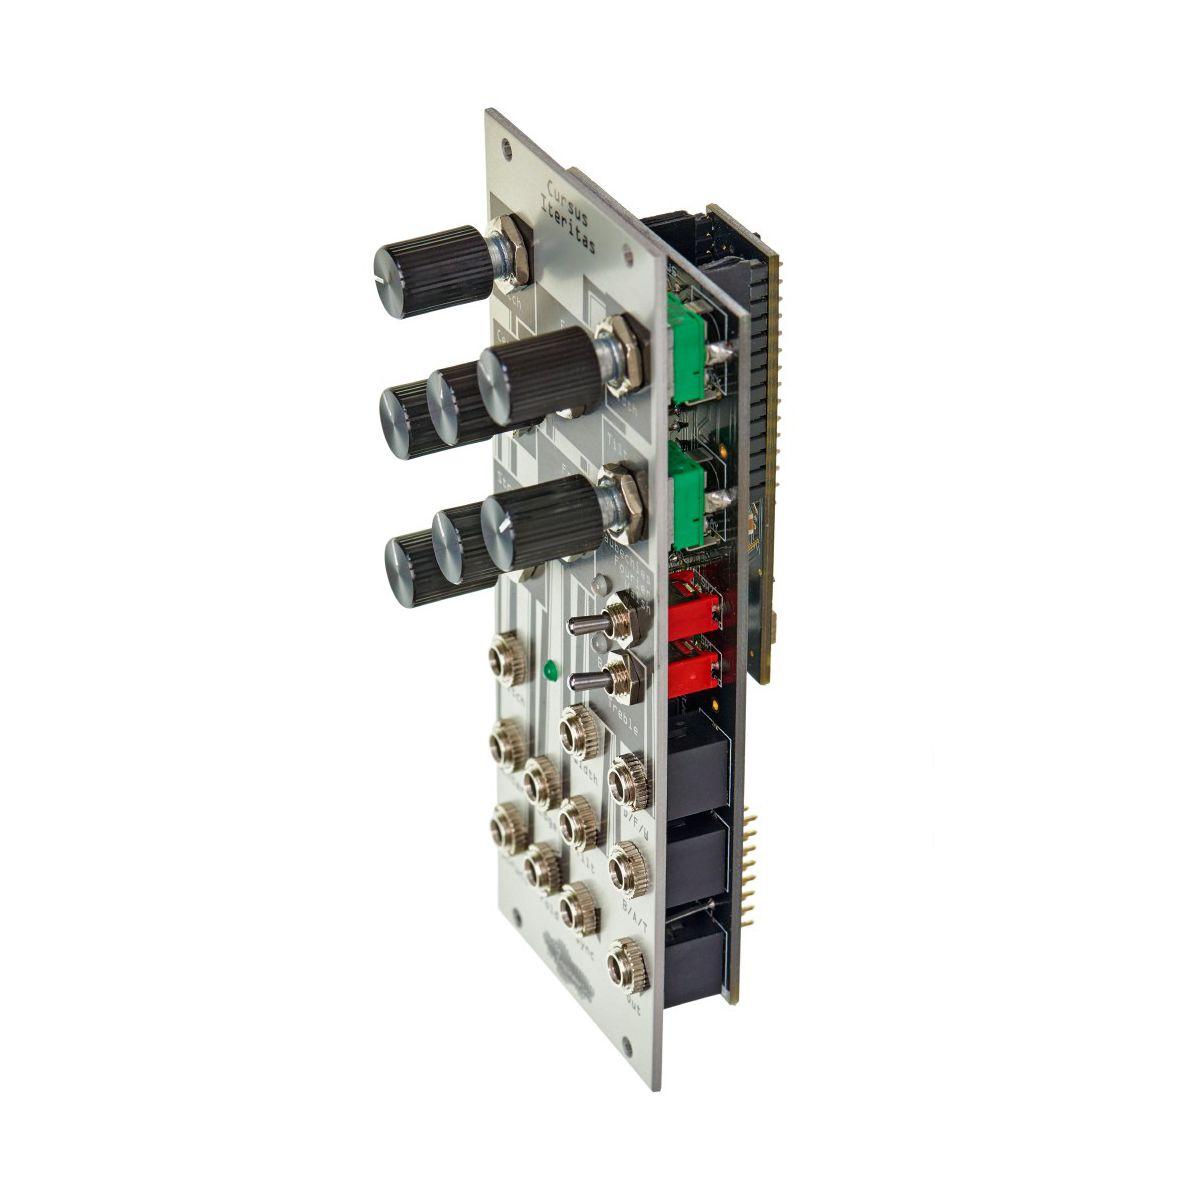 Noise Engineering Cursus Iteritas Eurorack Wavetable Oscillator Module (Silver)